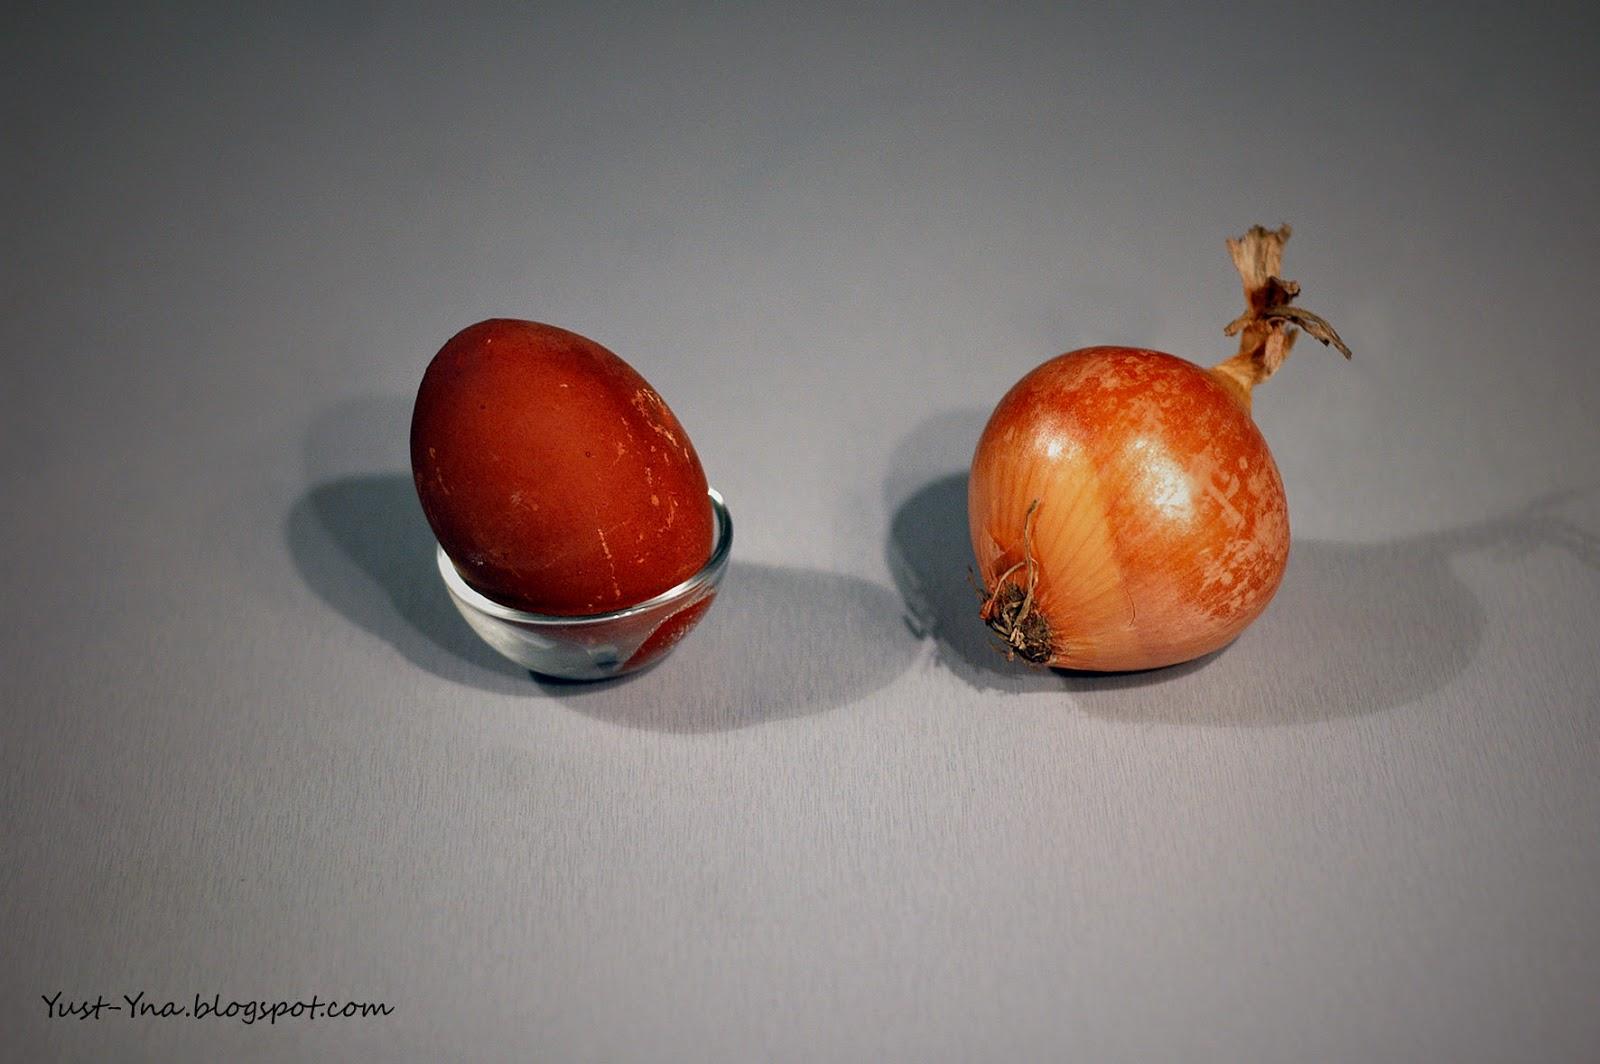 Farbowanie jajek cebulą